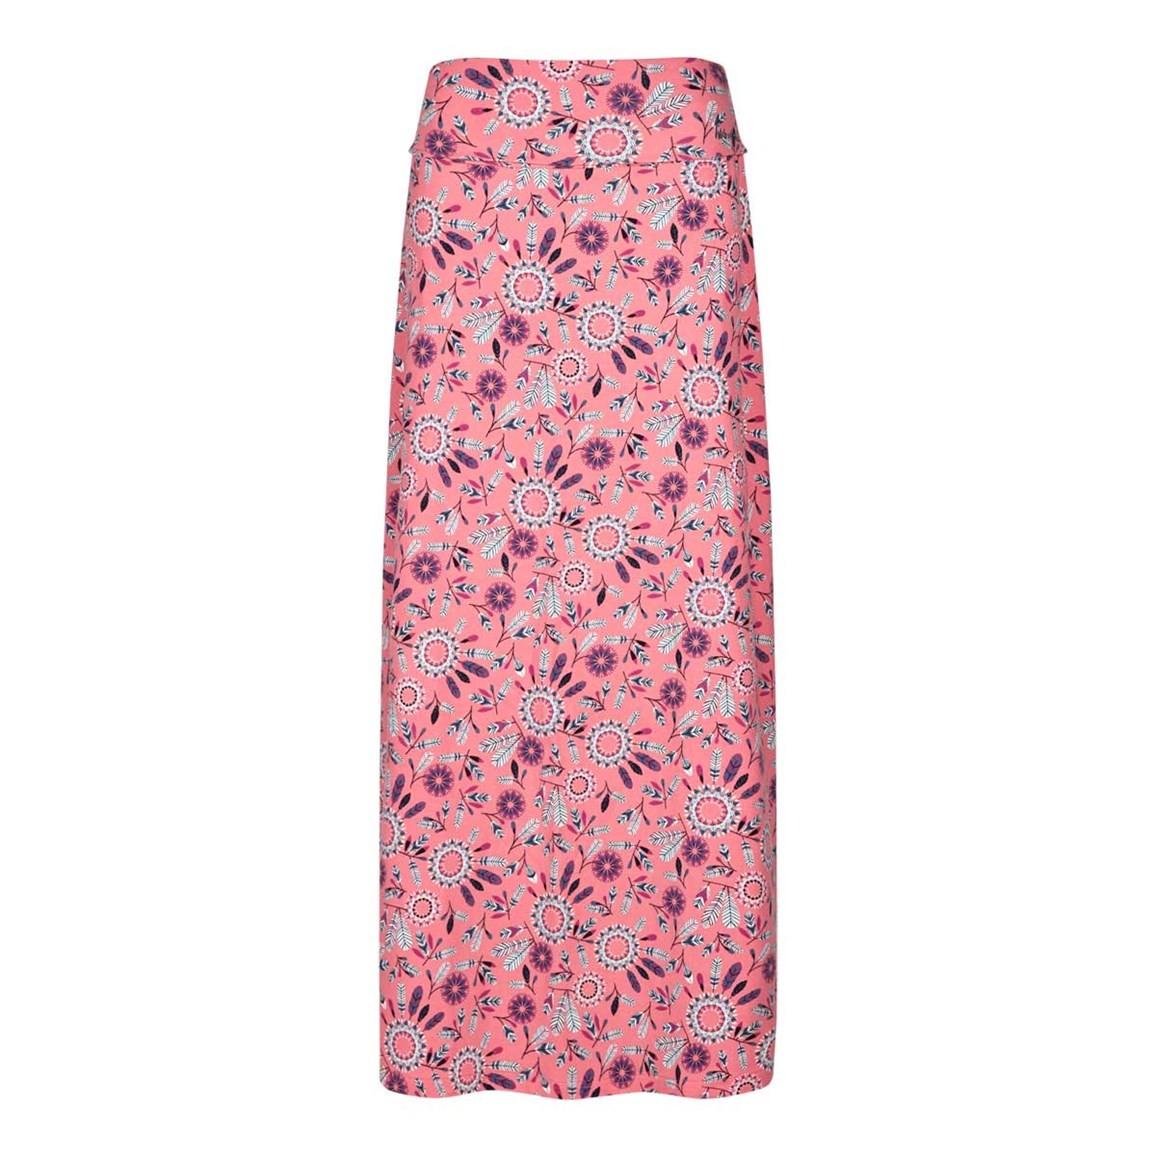 Weird Fish Suzette Printed Jersey Skirt Coral Pink